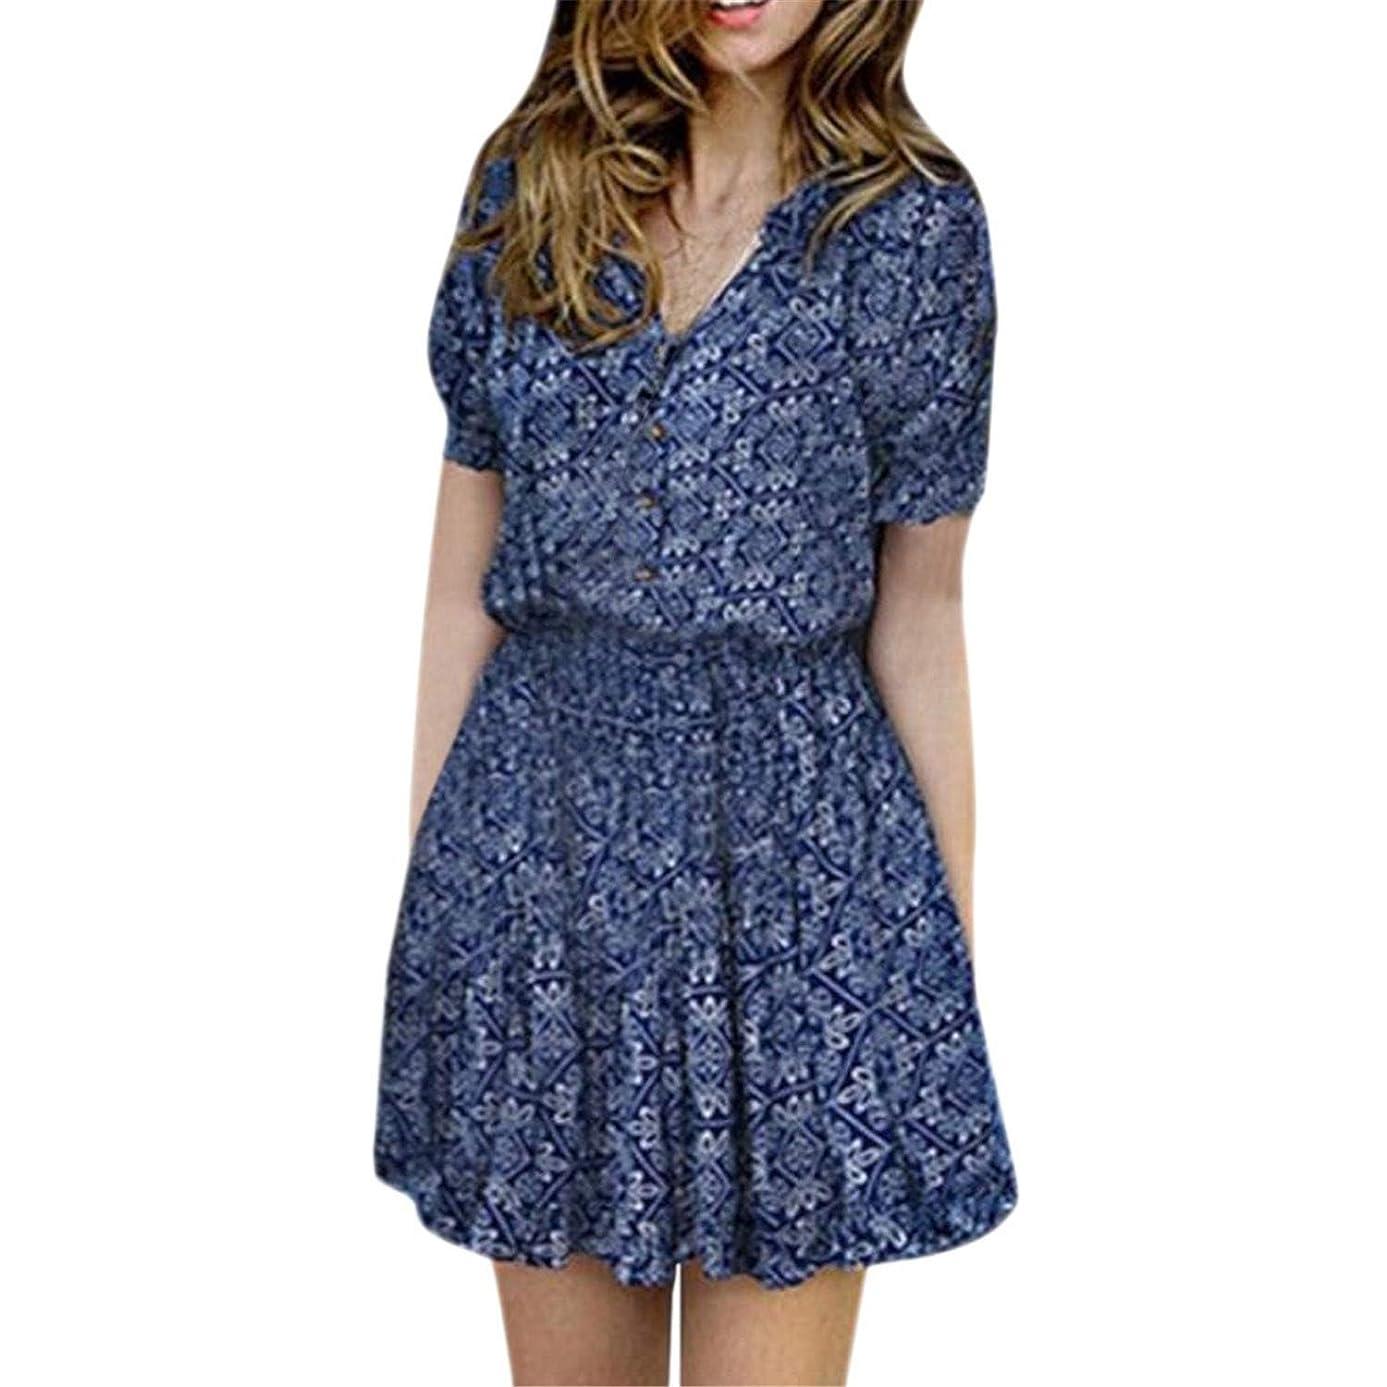 SALE Women Summer Floral Print V-neckline Casual Short Sleeve Mini Dress New arrival